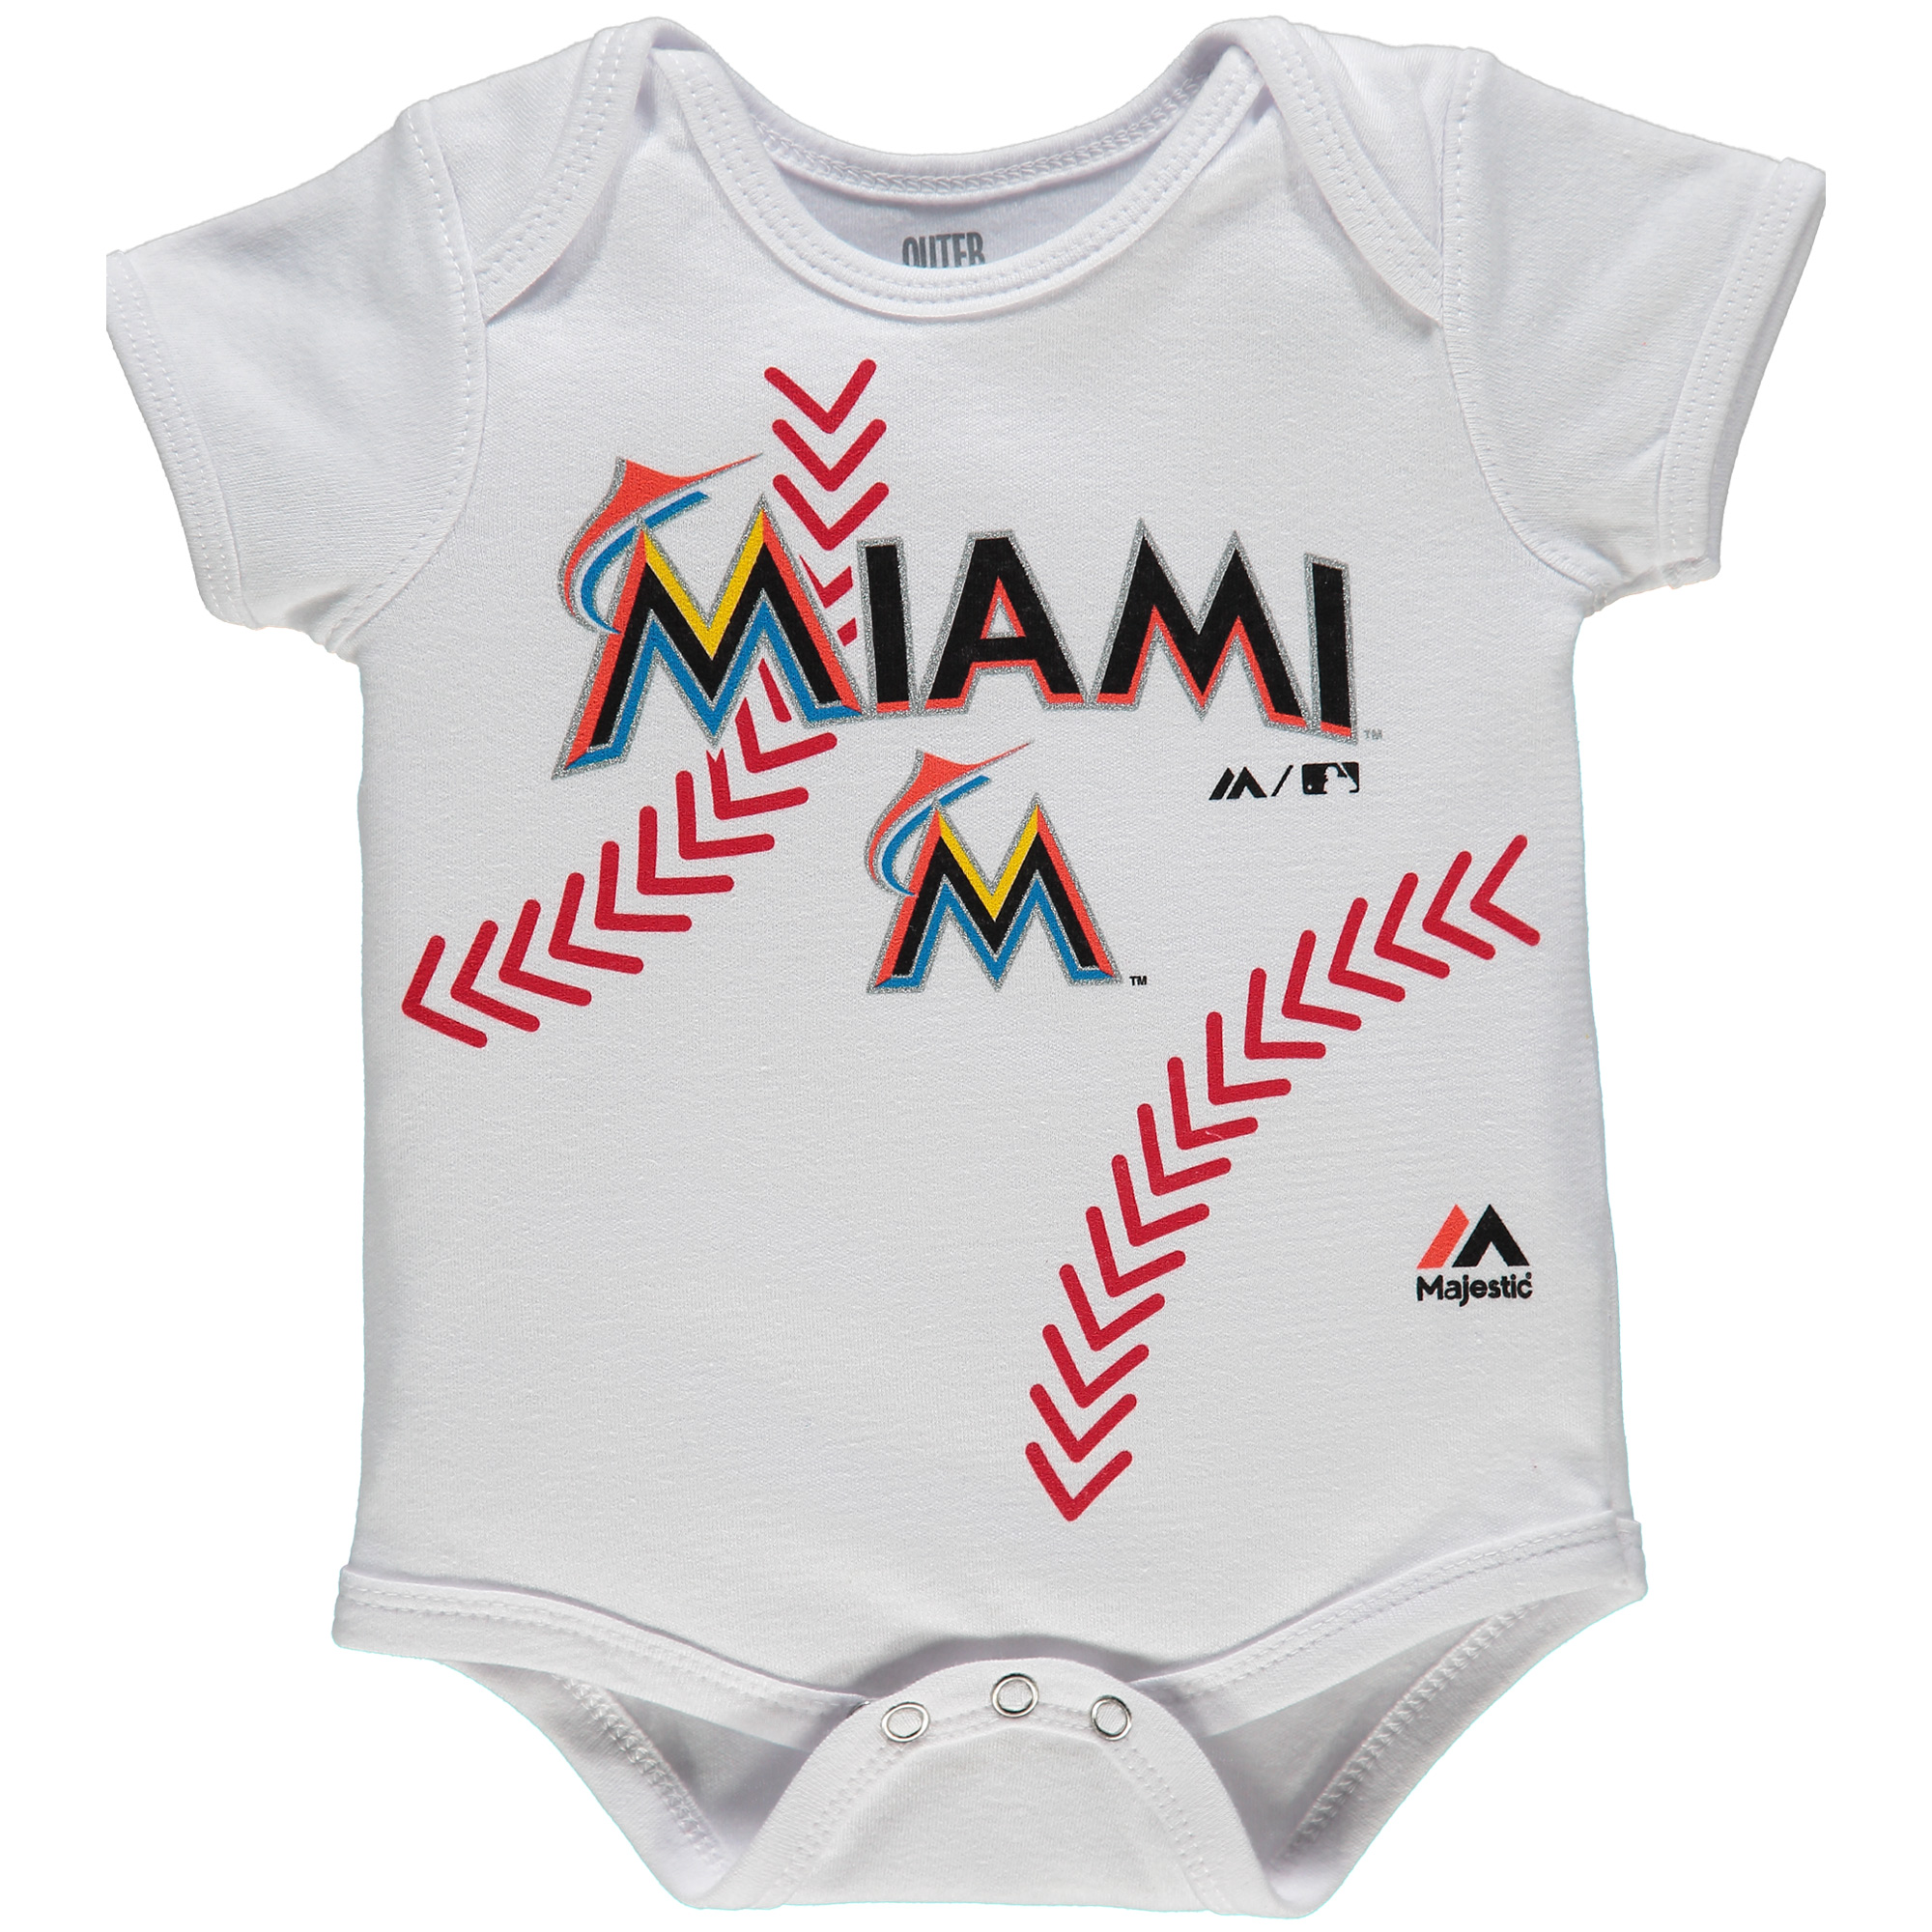 Miami Marlins Majestic Newborn Stitches Baseball Bodysuit - White